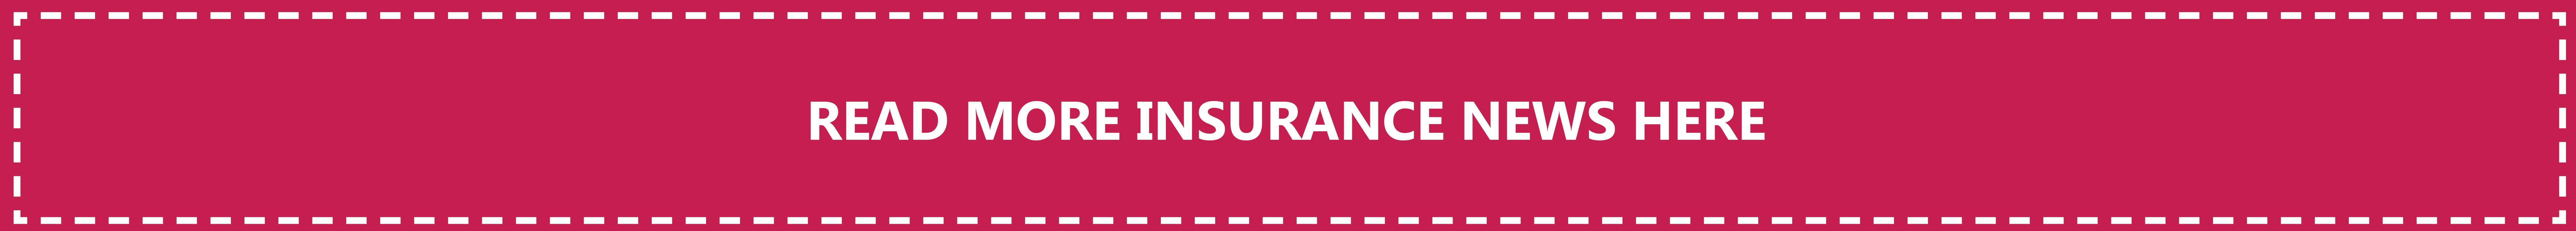 Car insurance premiums fall, climate risk vulnerability & more...